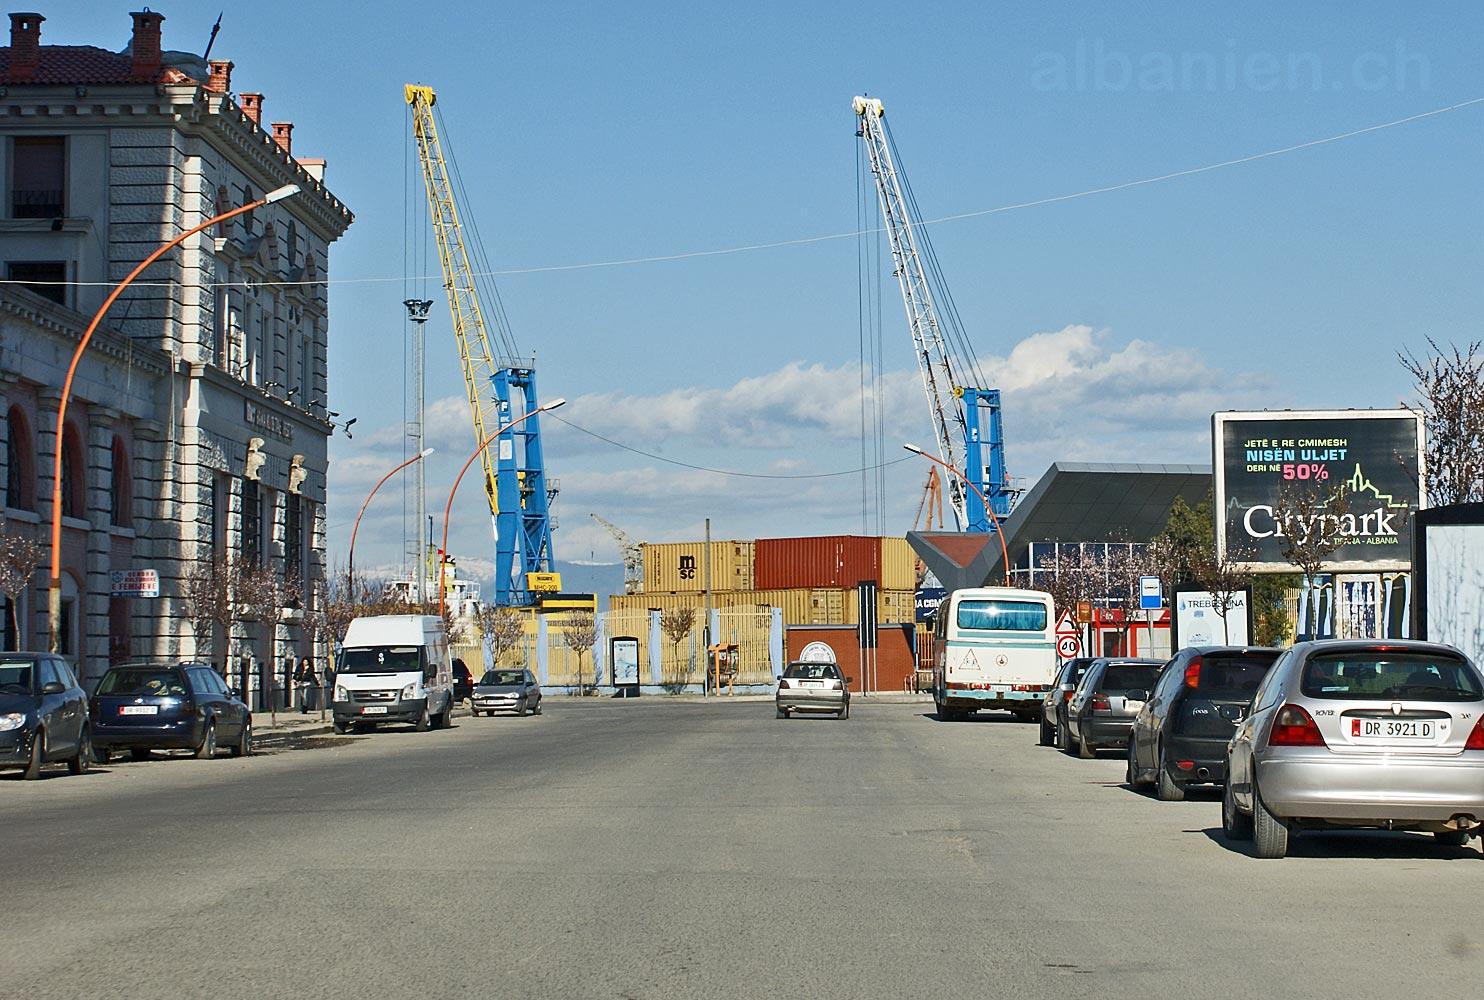 Durrës Hafenkran